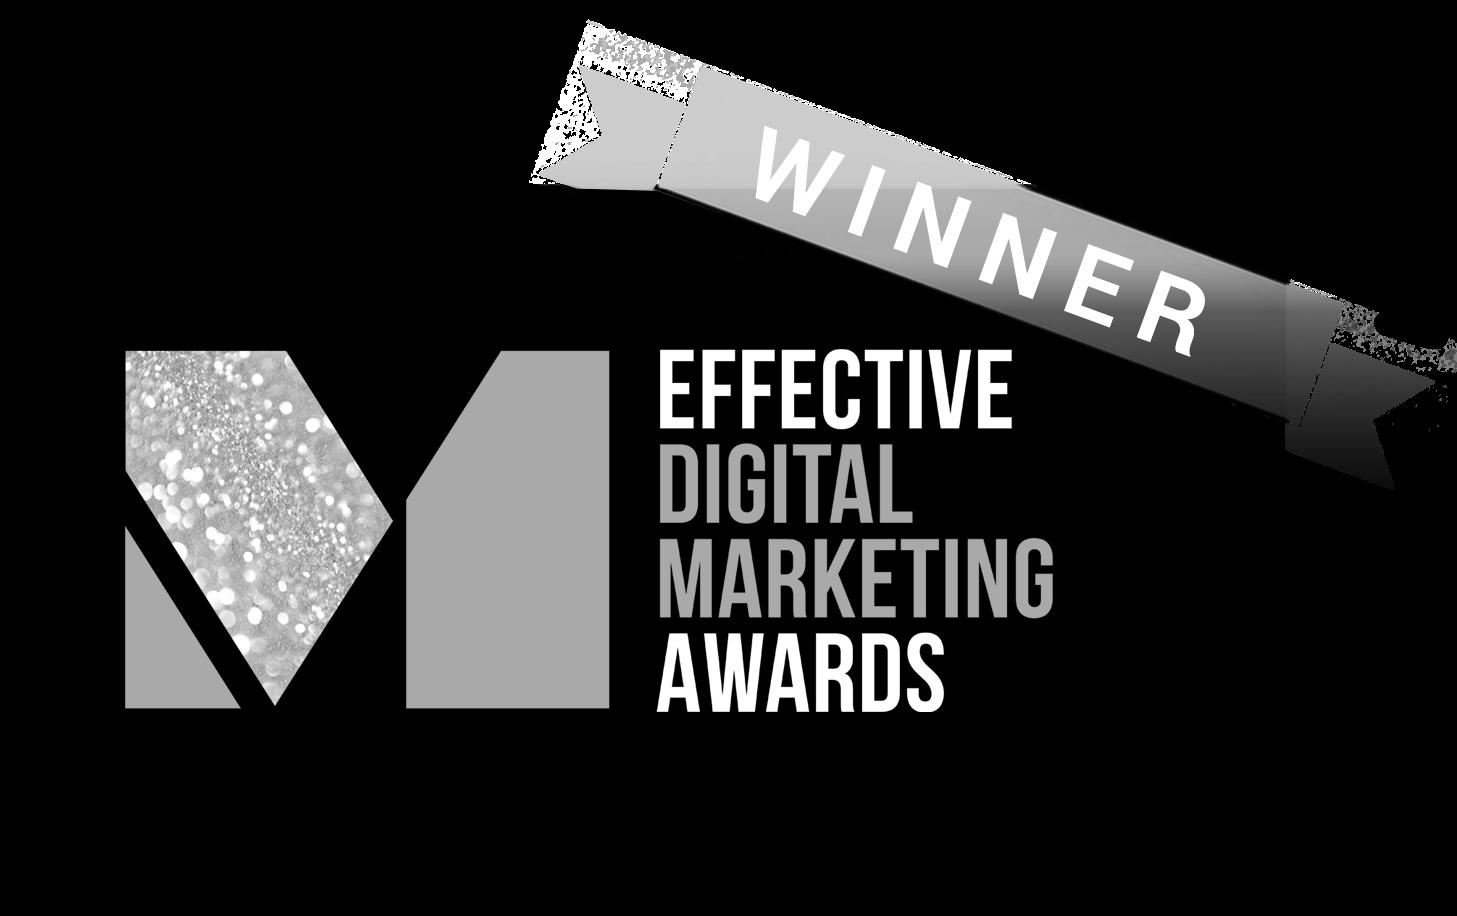 Effective Digital Marketing Awards Winner